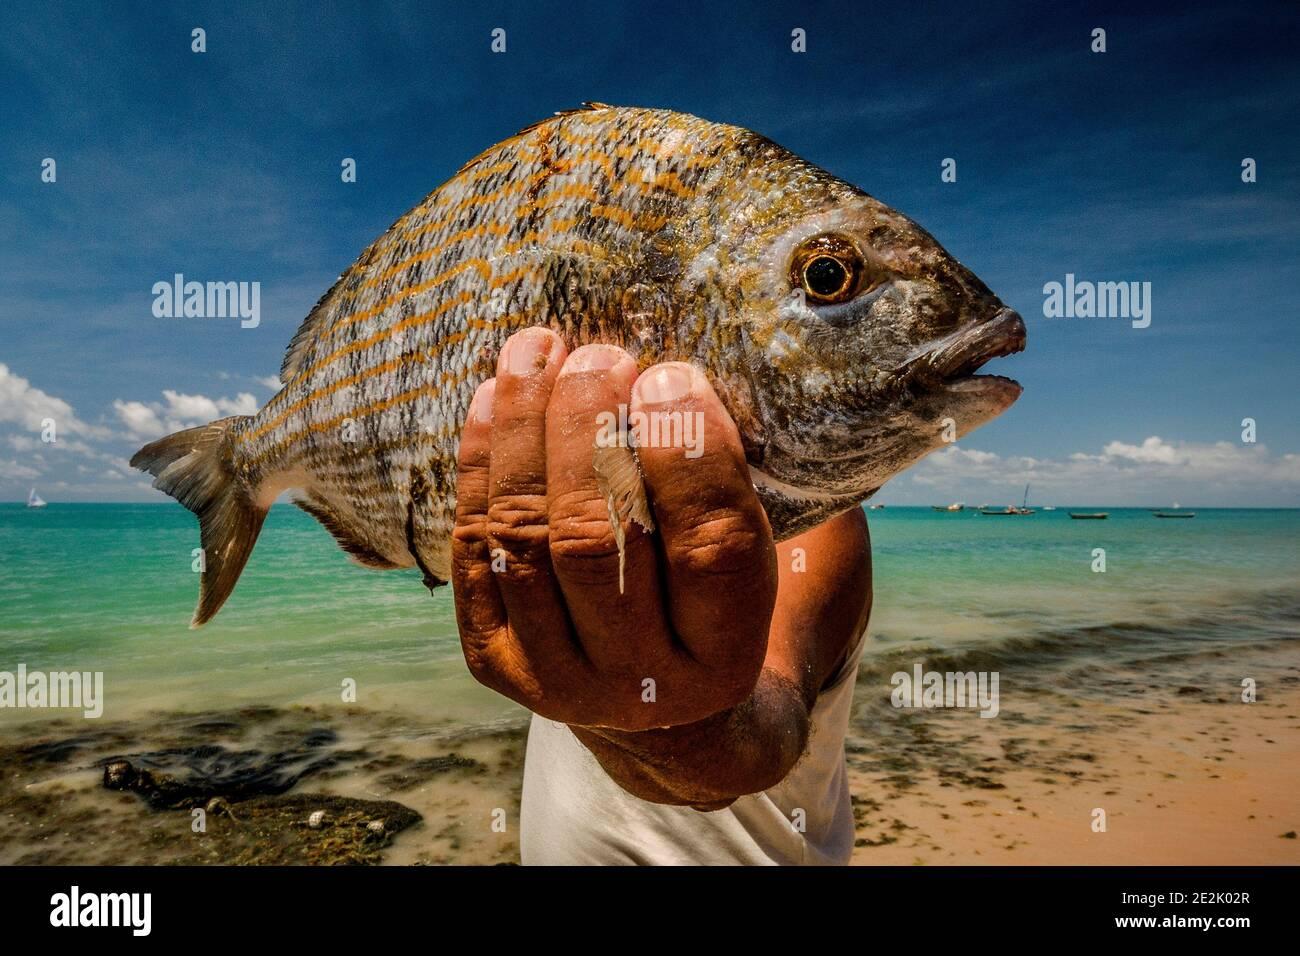 Fisherman holding a fish flat on a beach in Maceió, Brazil Stock Photo